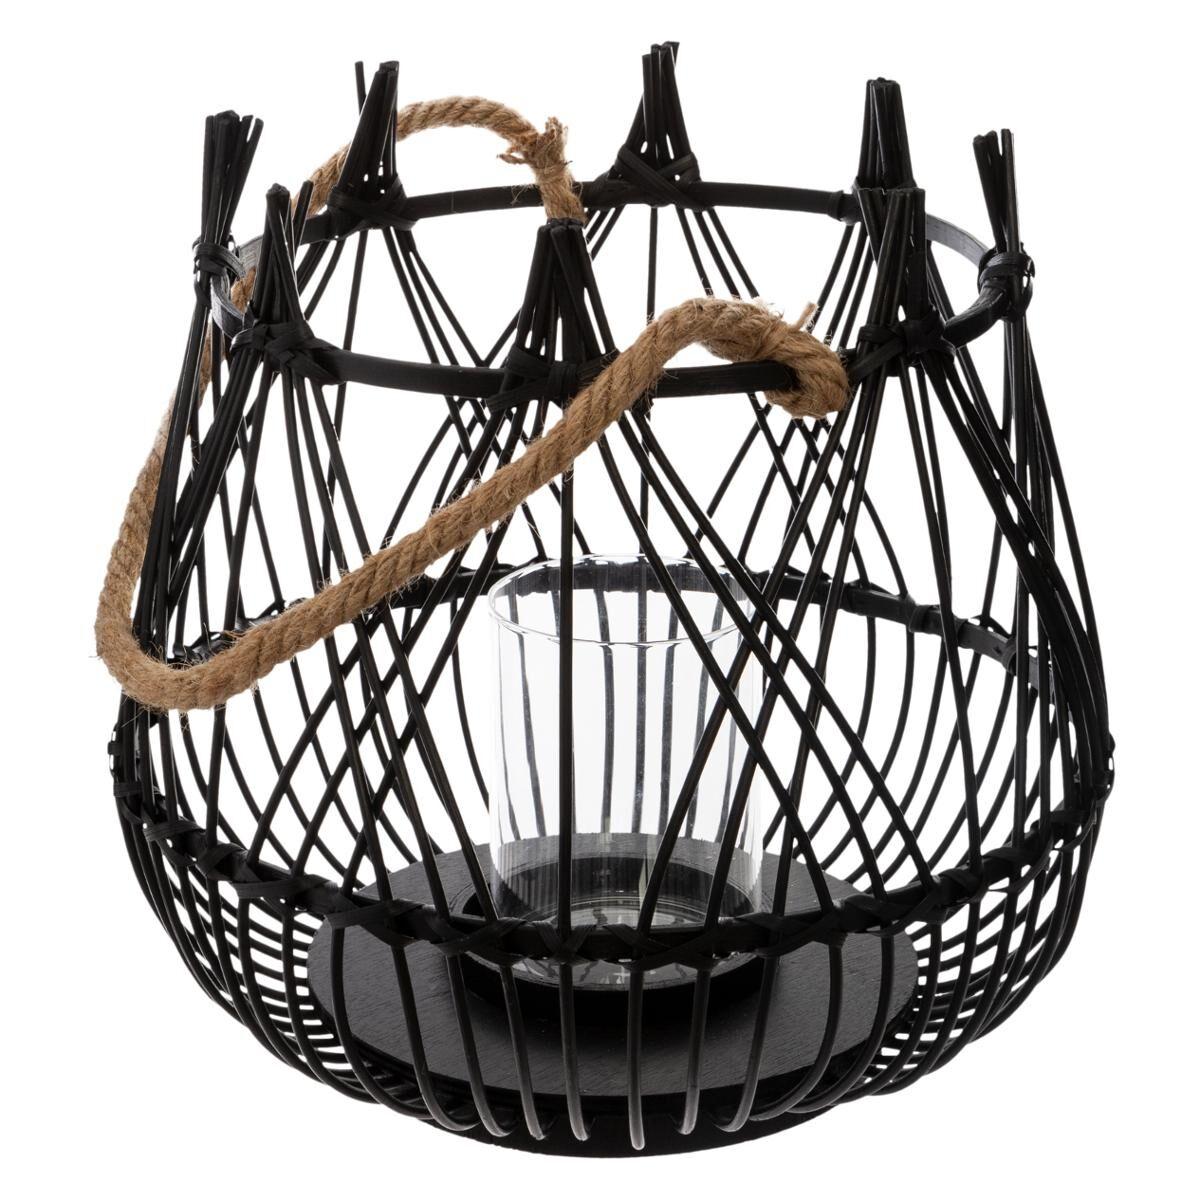 ATMOSPHERA Lanterne panier Jardin H.31 cm